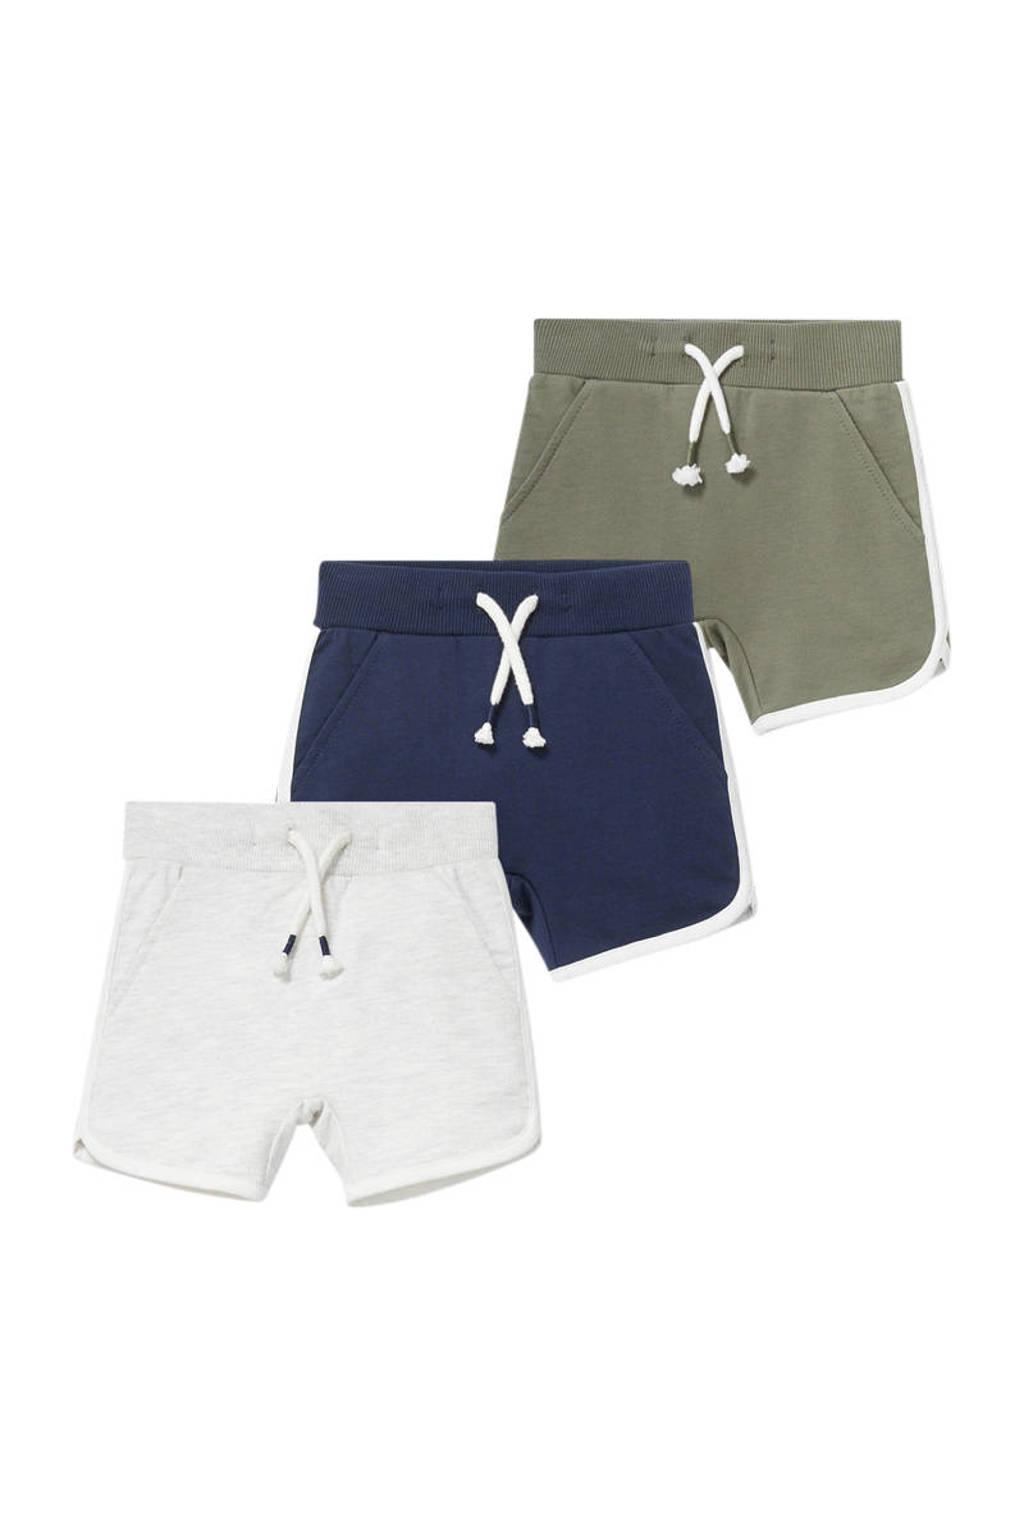 C&A Baby Club sweatshort - set van 3 ecru/donkerblauw/groen, Ecru/donkerblauw/groen